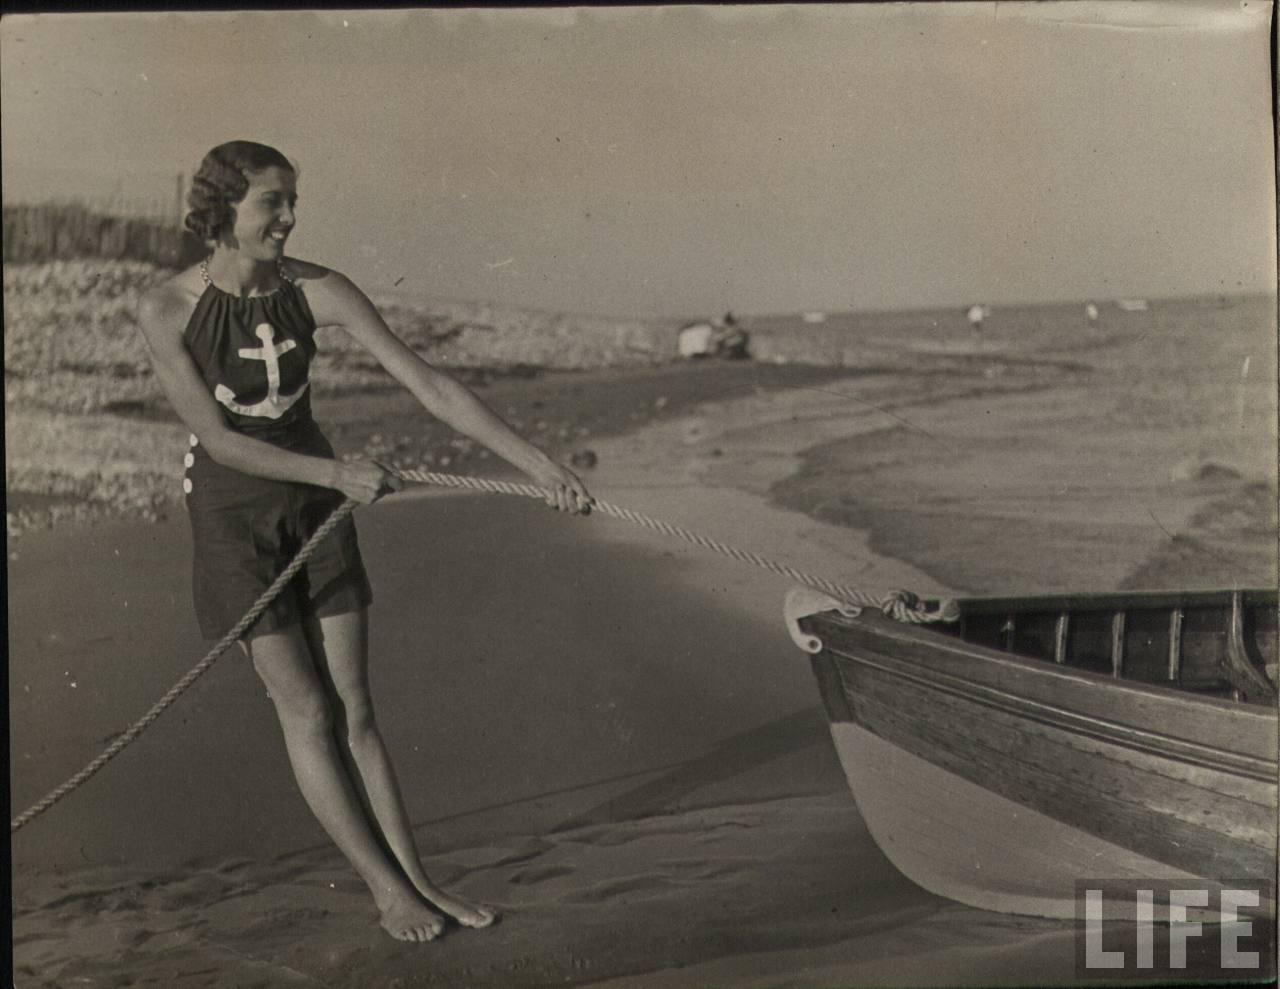 Vintage Snapshots of Summer Fun on the Beach ~ vintage